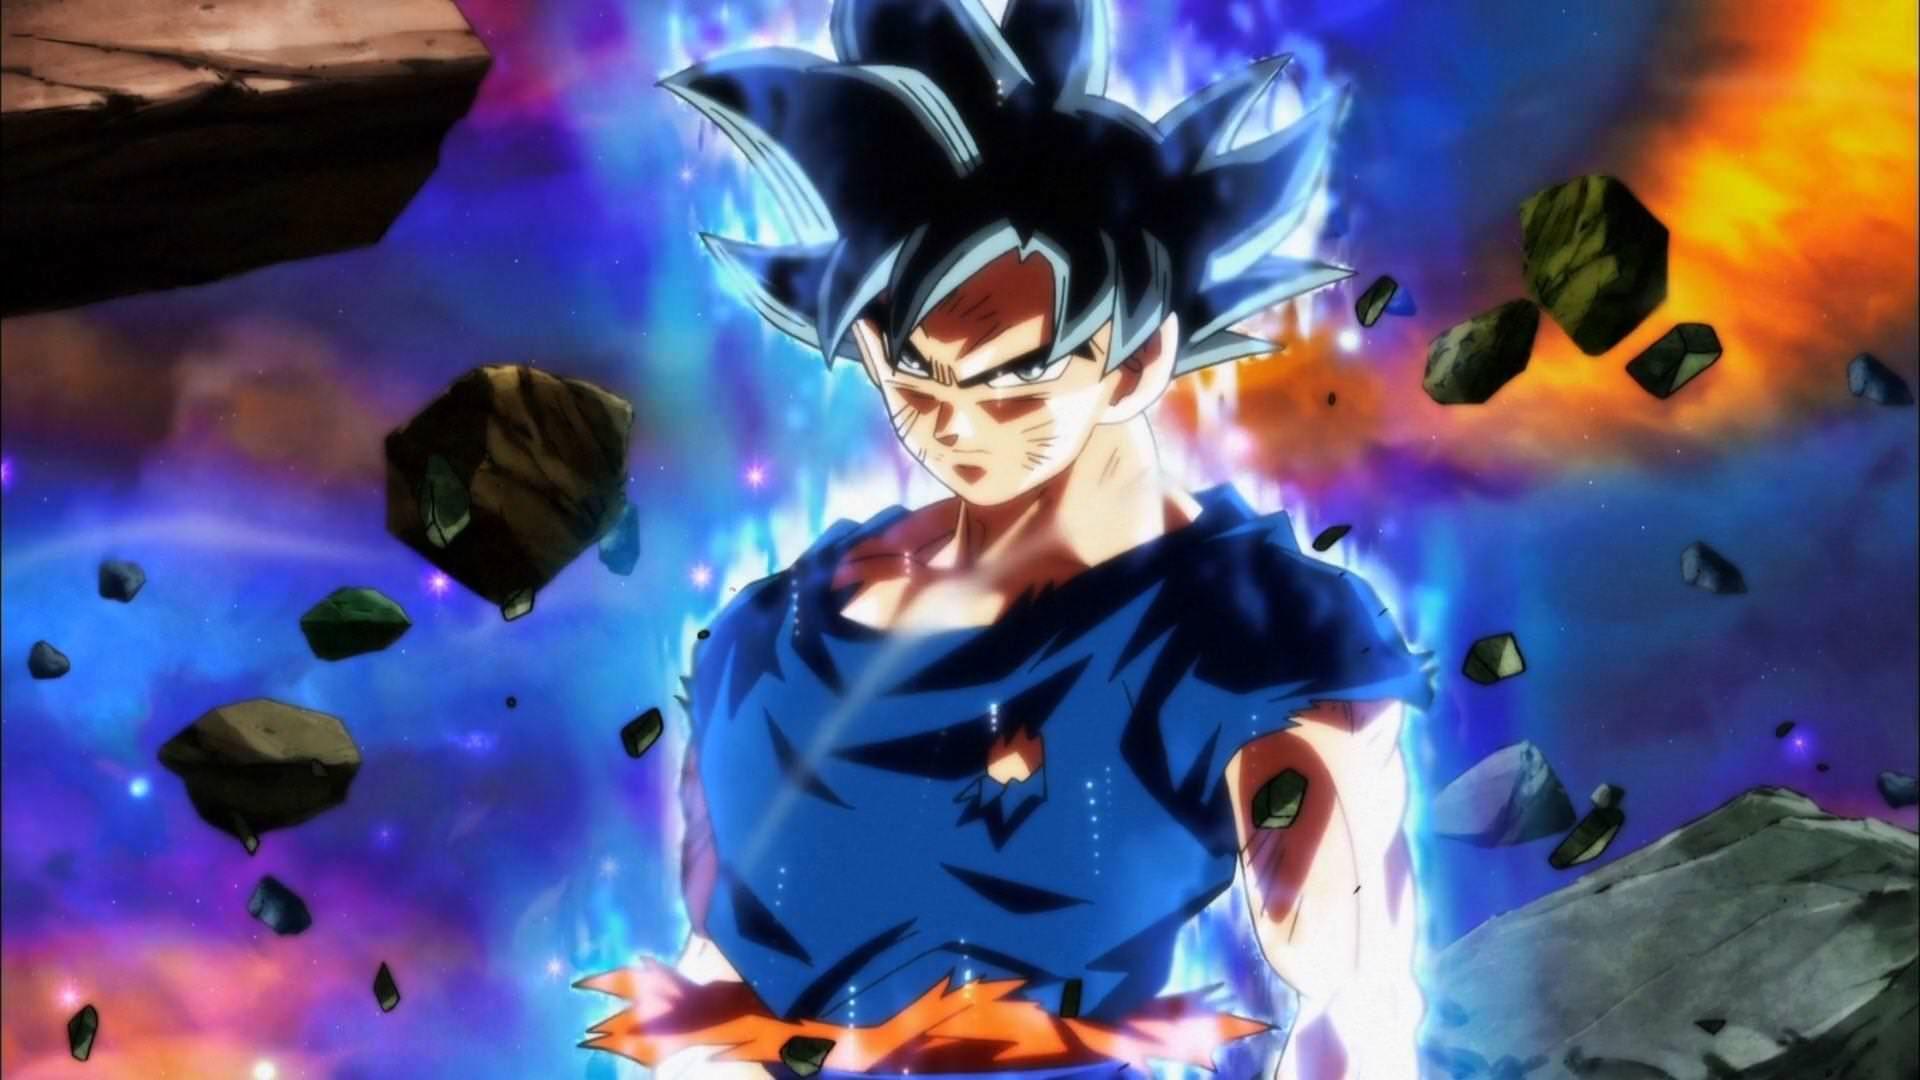 Made A Wallpaper Of Ultra Instinct Goku For Y All 1920x1080 Dragon Ball Super Goku Dragon Ball Dragon Ball Super